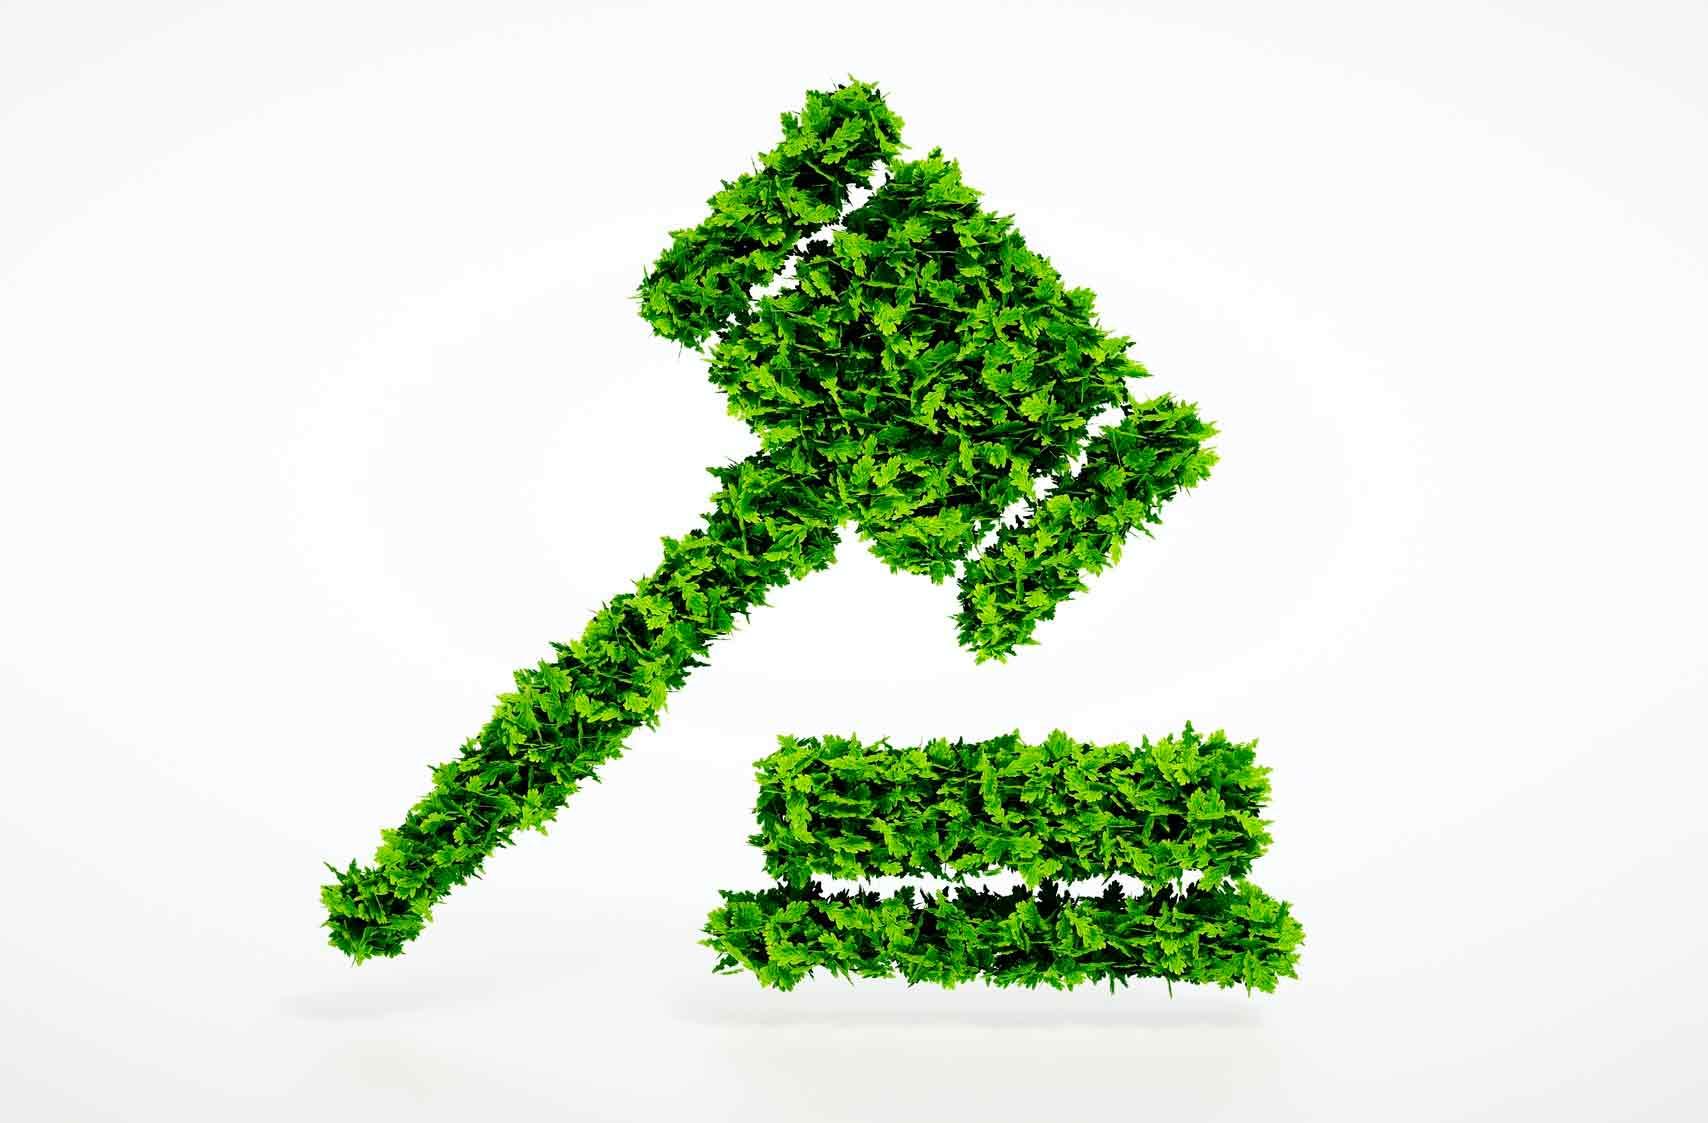 Green Regulations